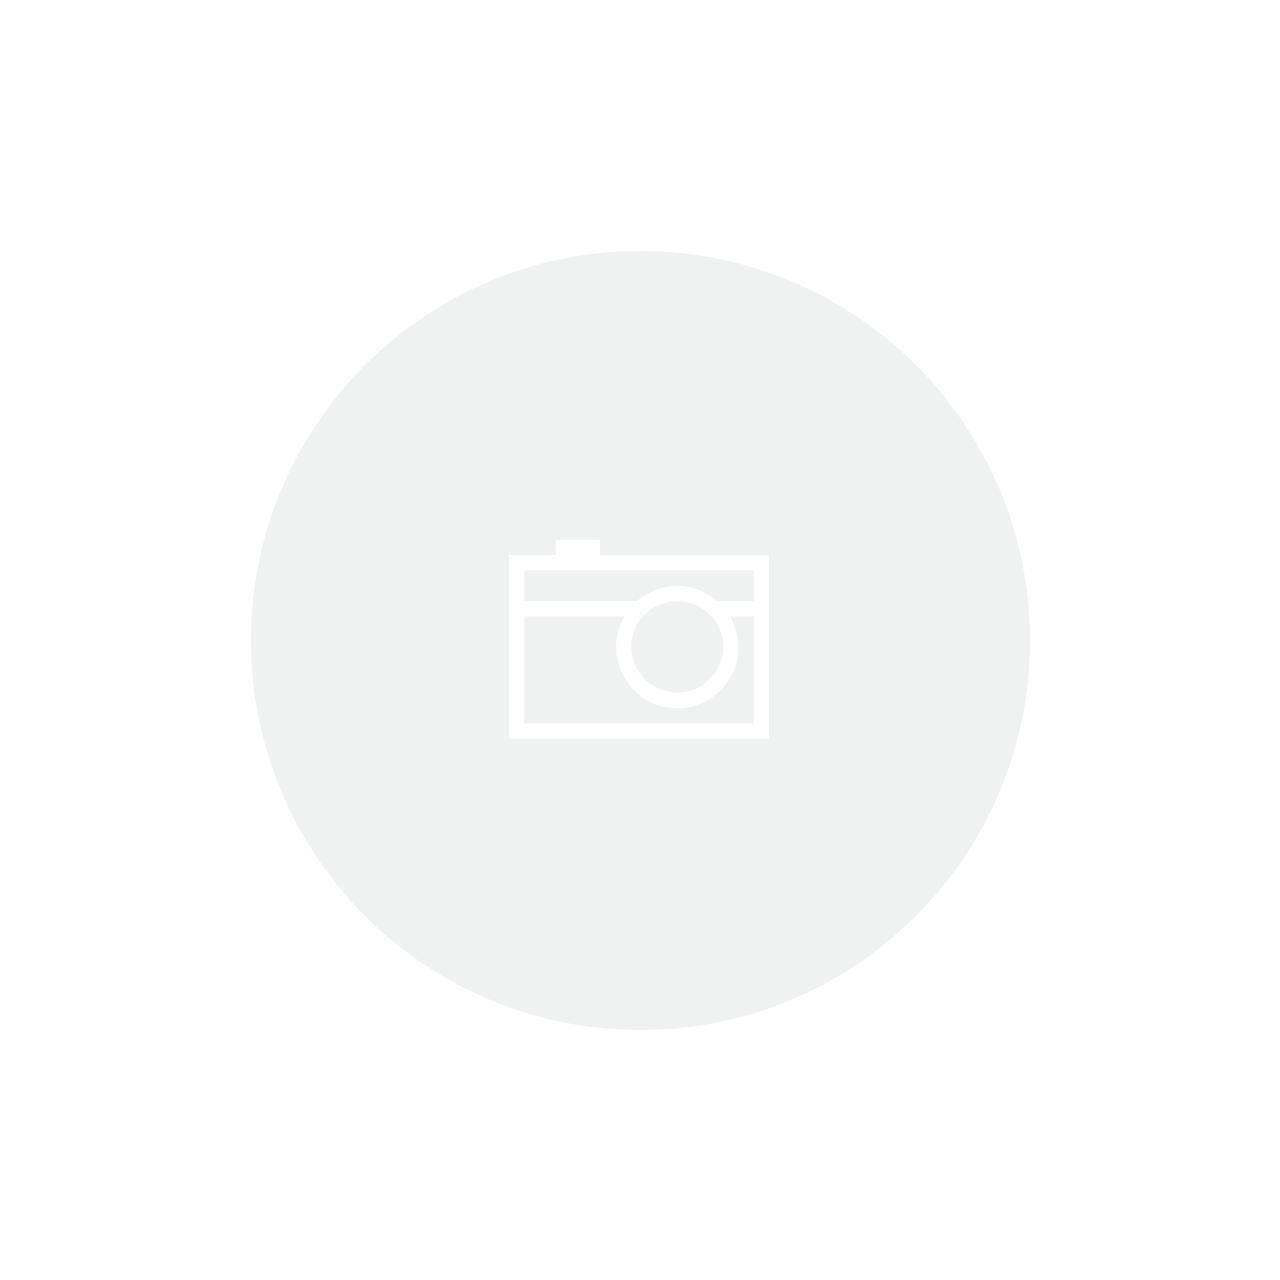 Colher de Nylon Utilitá Tramontina